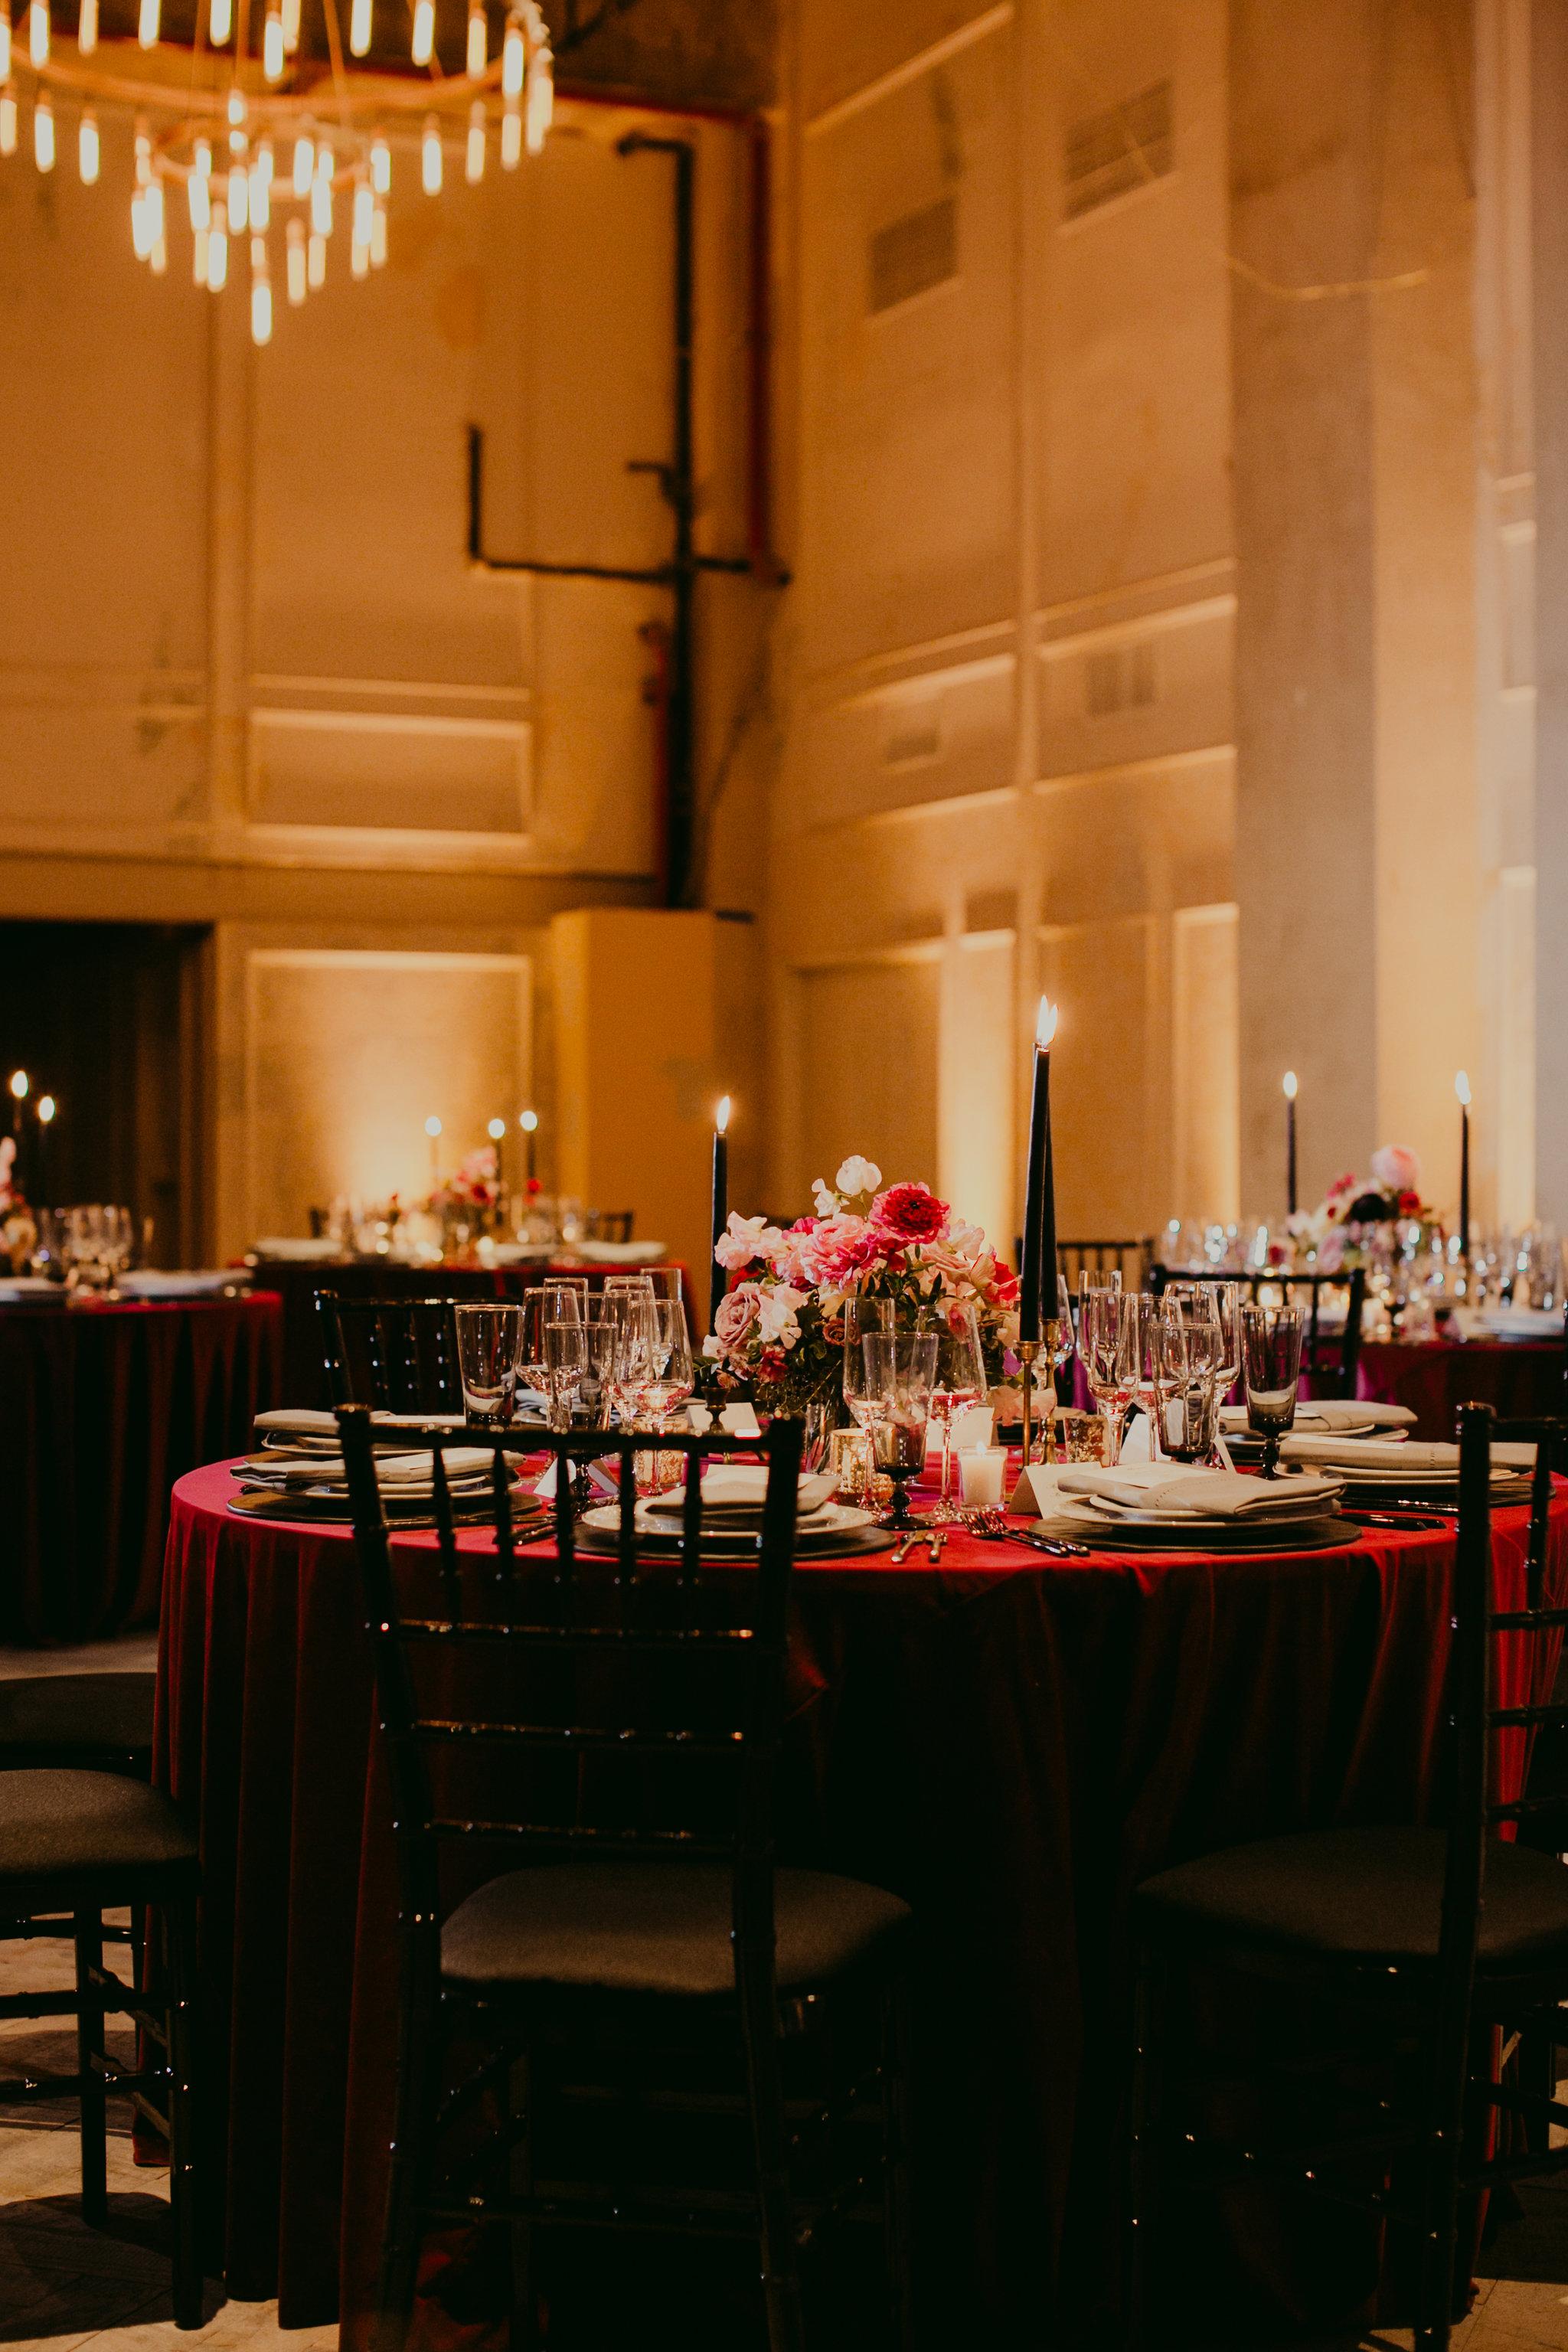 Williamsburg_Hotel_Wedding_Photographer_Chellise_Michael_Photography-261.jpg